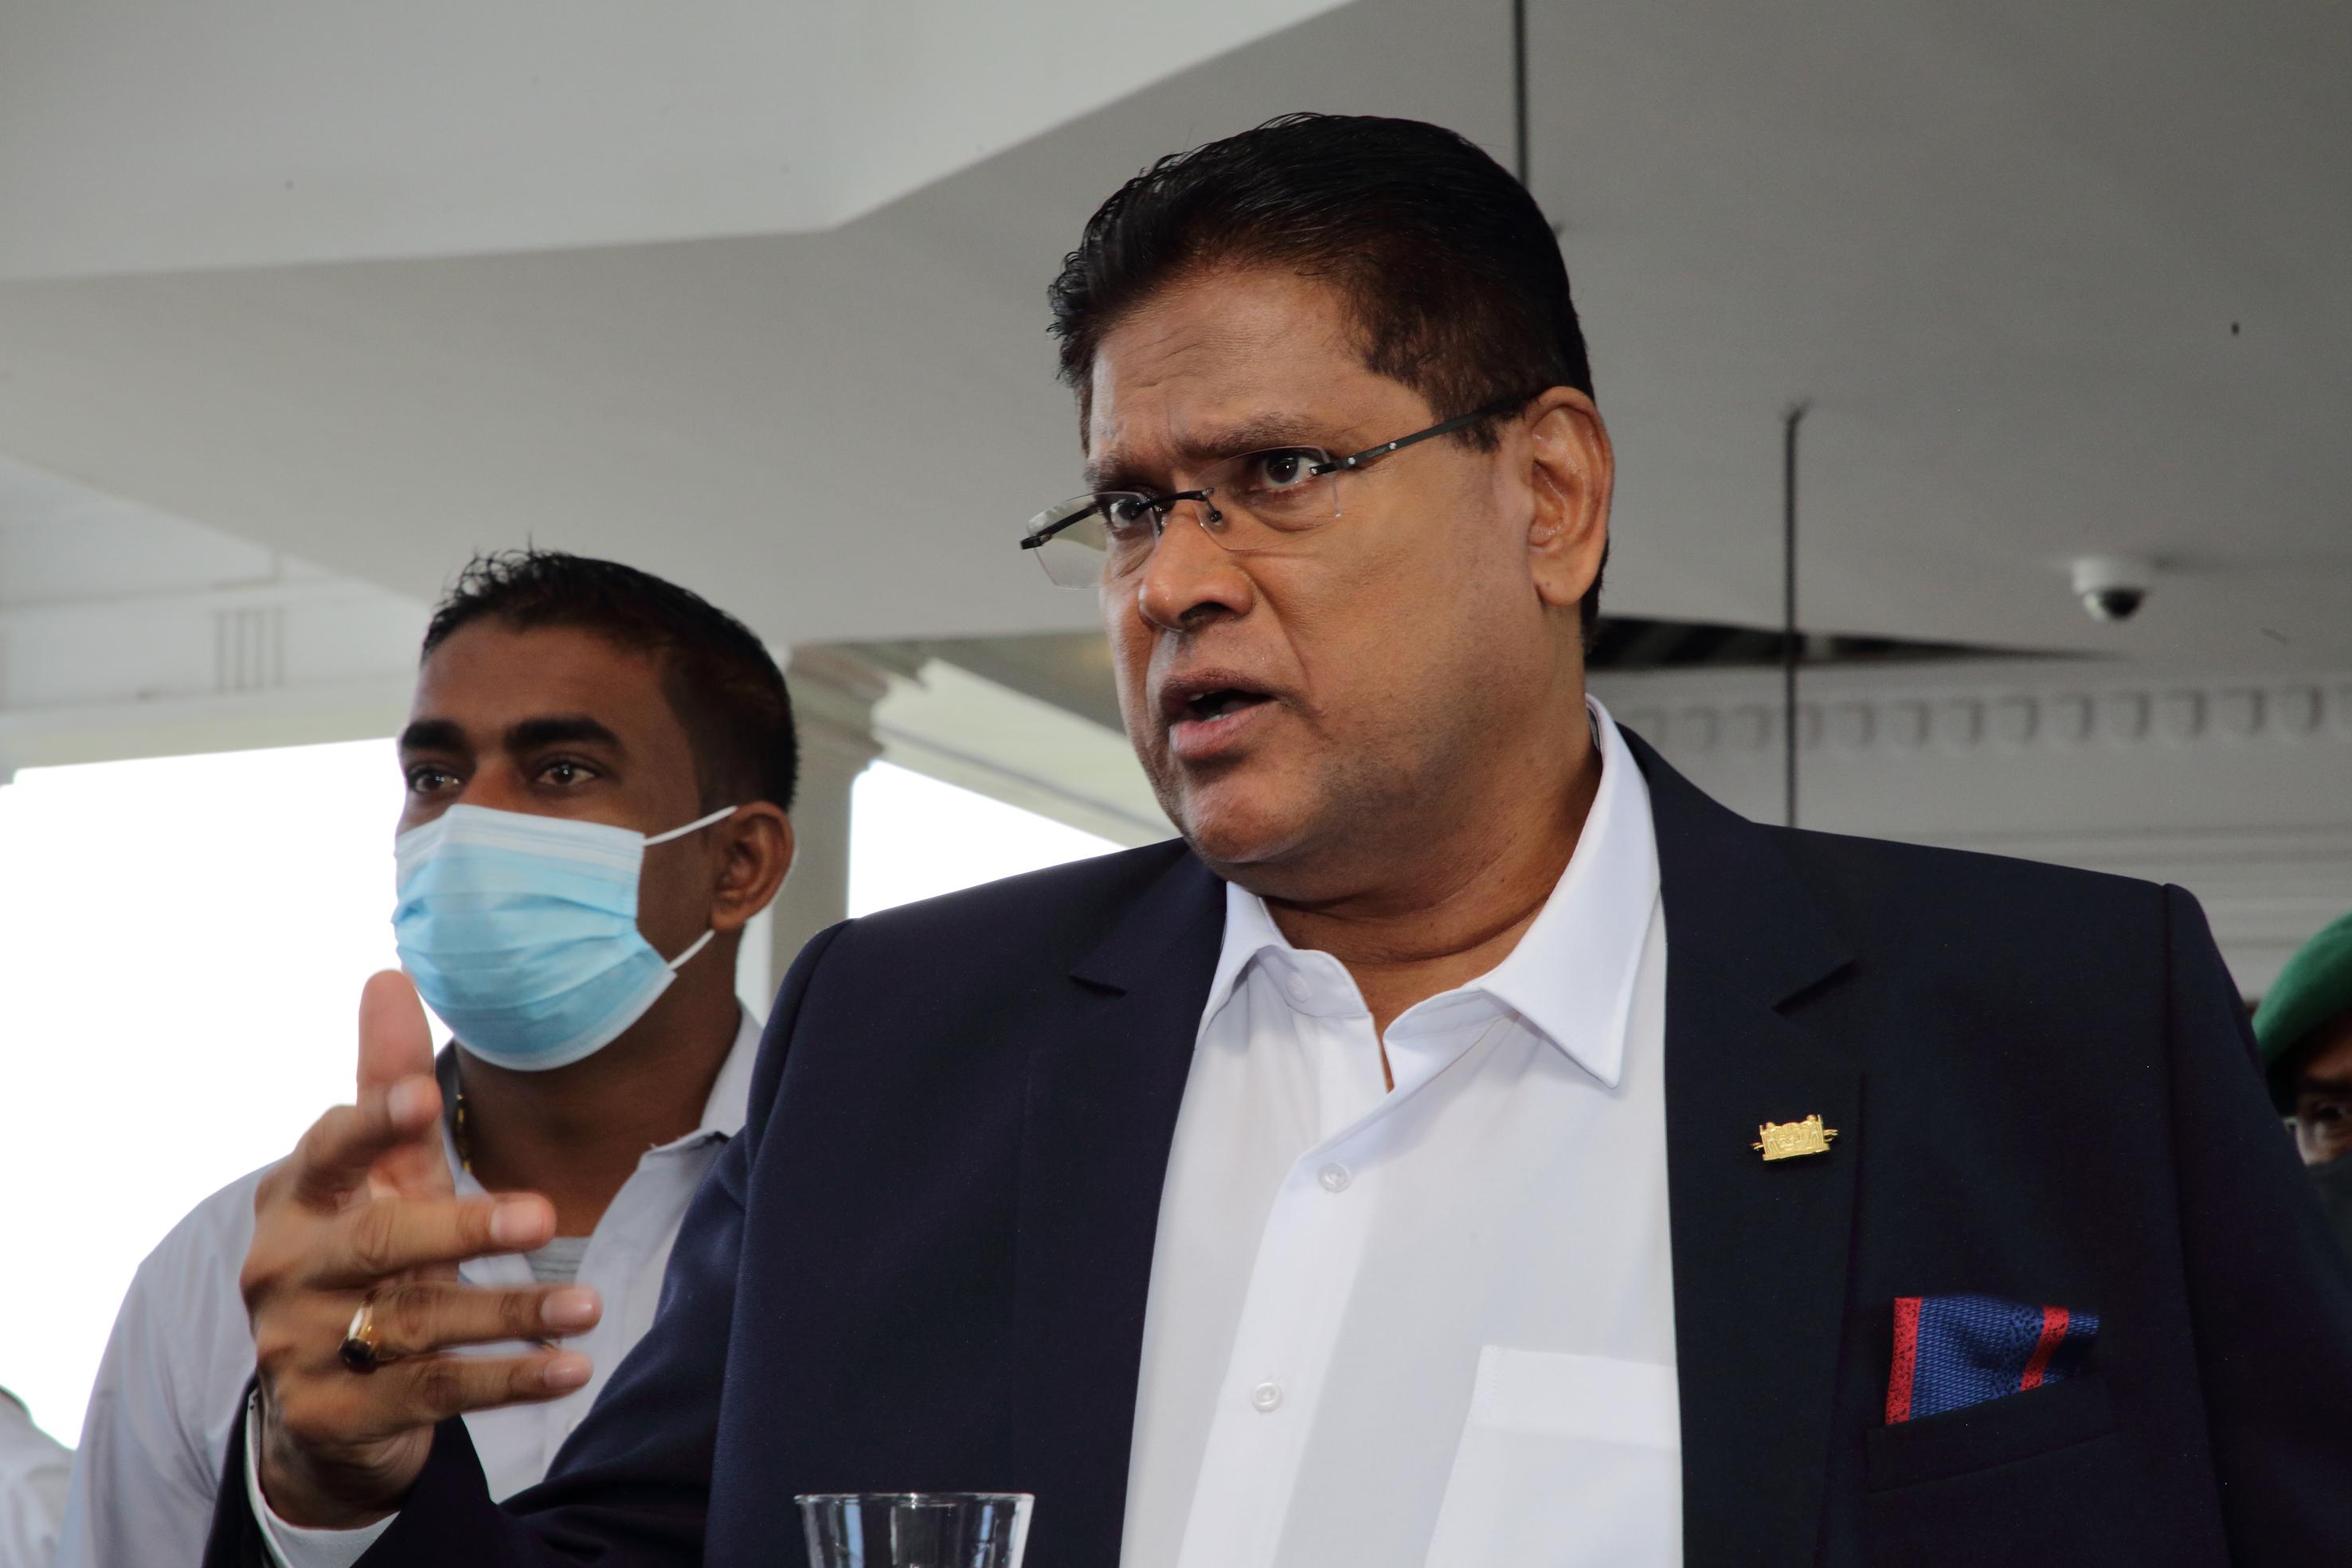 Een foto van president Chan Santokhi van Suriname